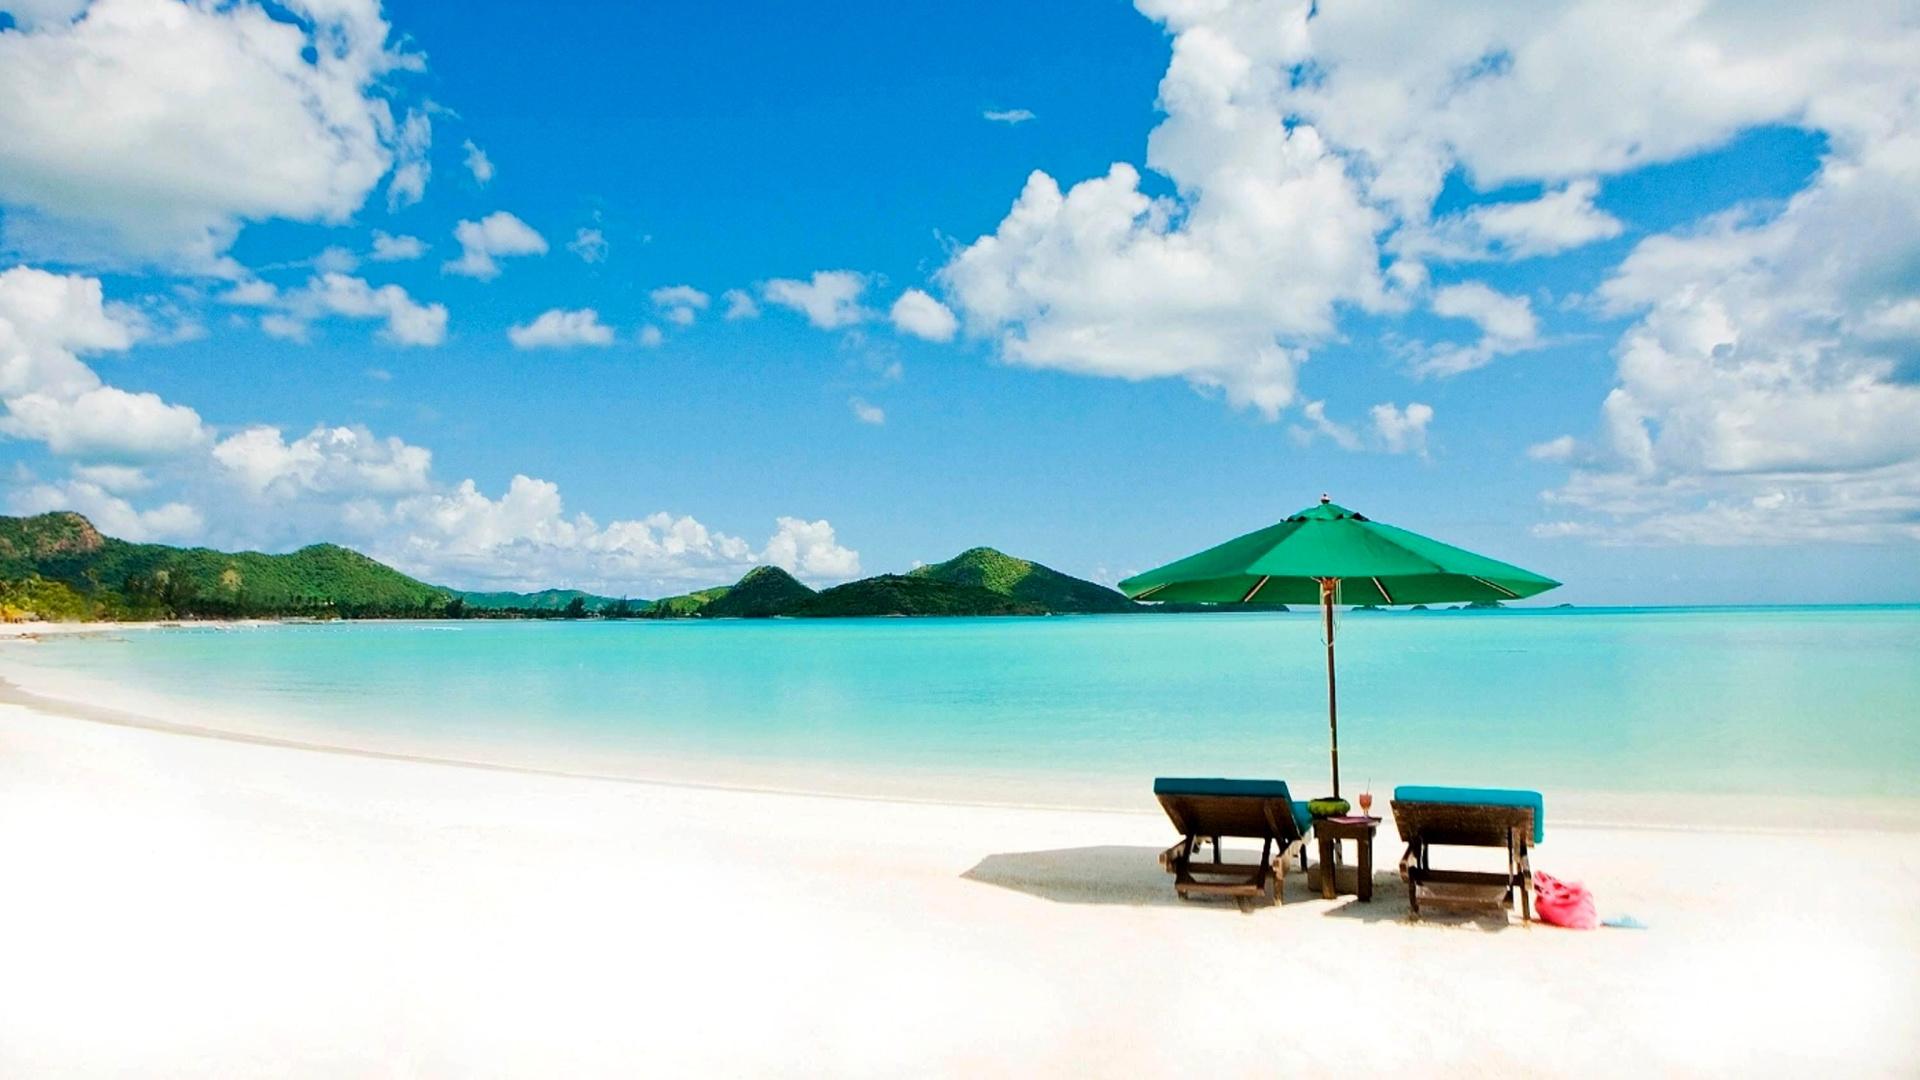 Tropical Paradise Beach Hd Wallpaper For Nexus 7 Screens: Tropical Paradise White Beach Wallpaper For Desktop